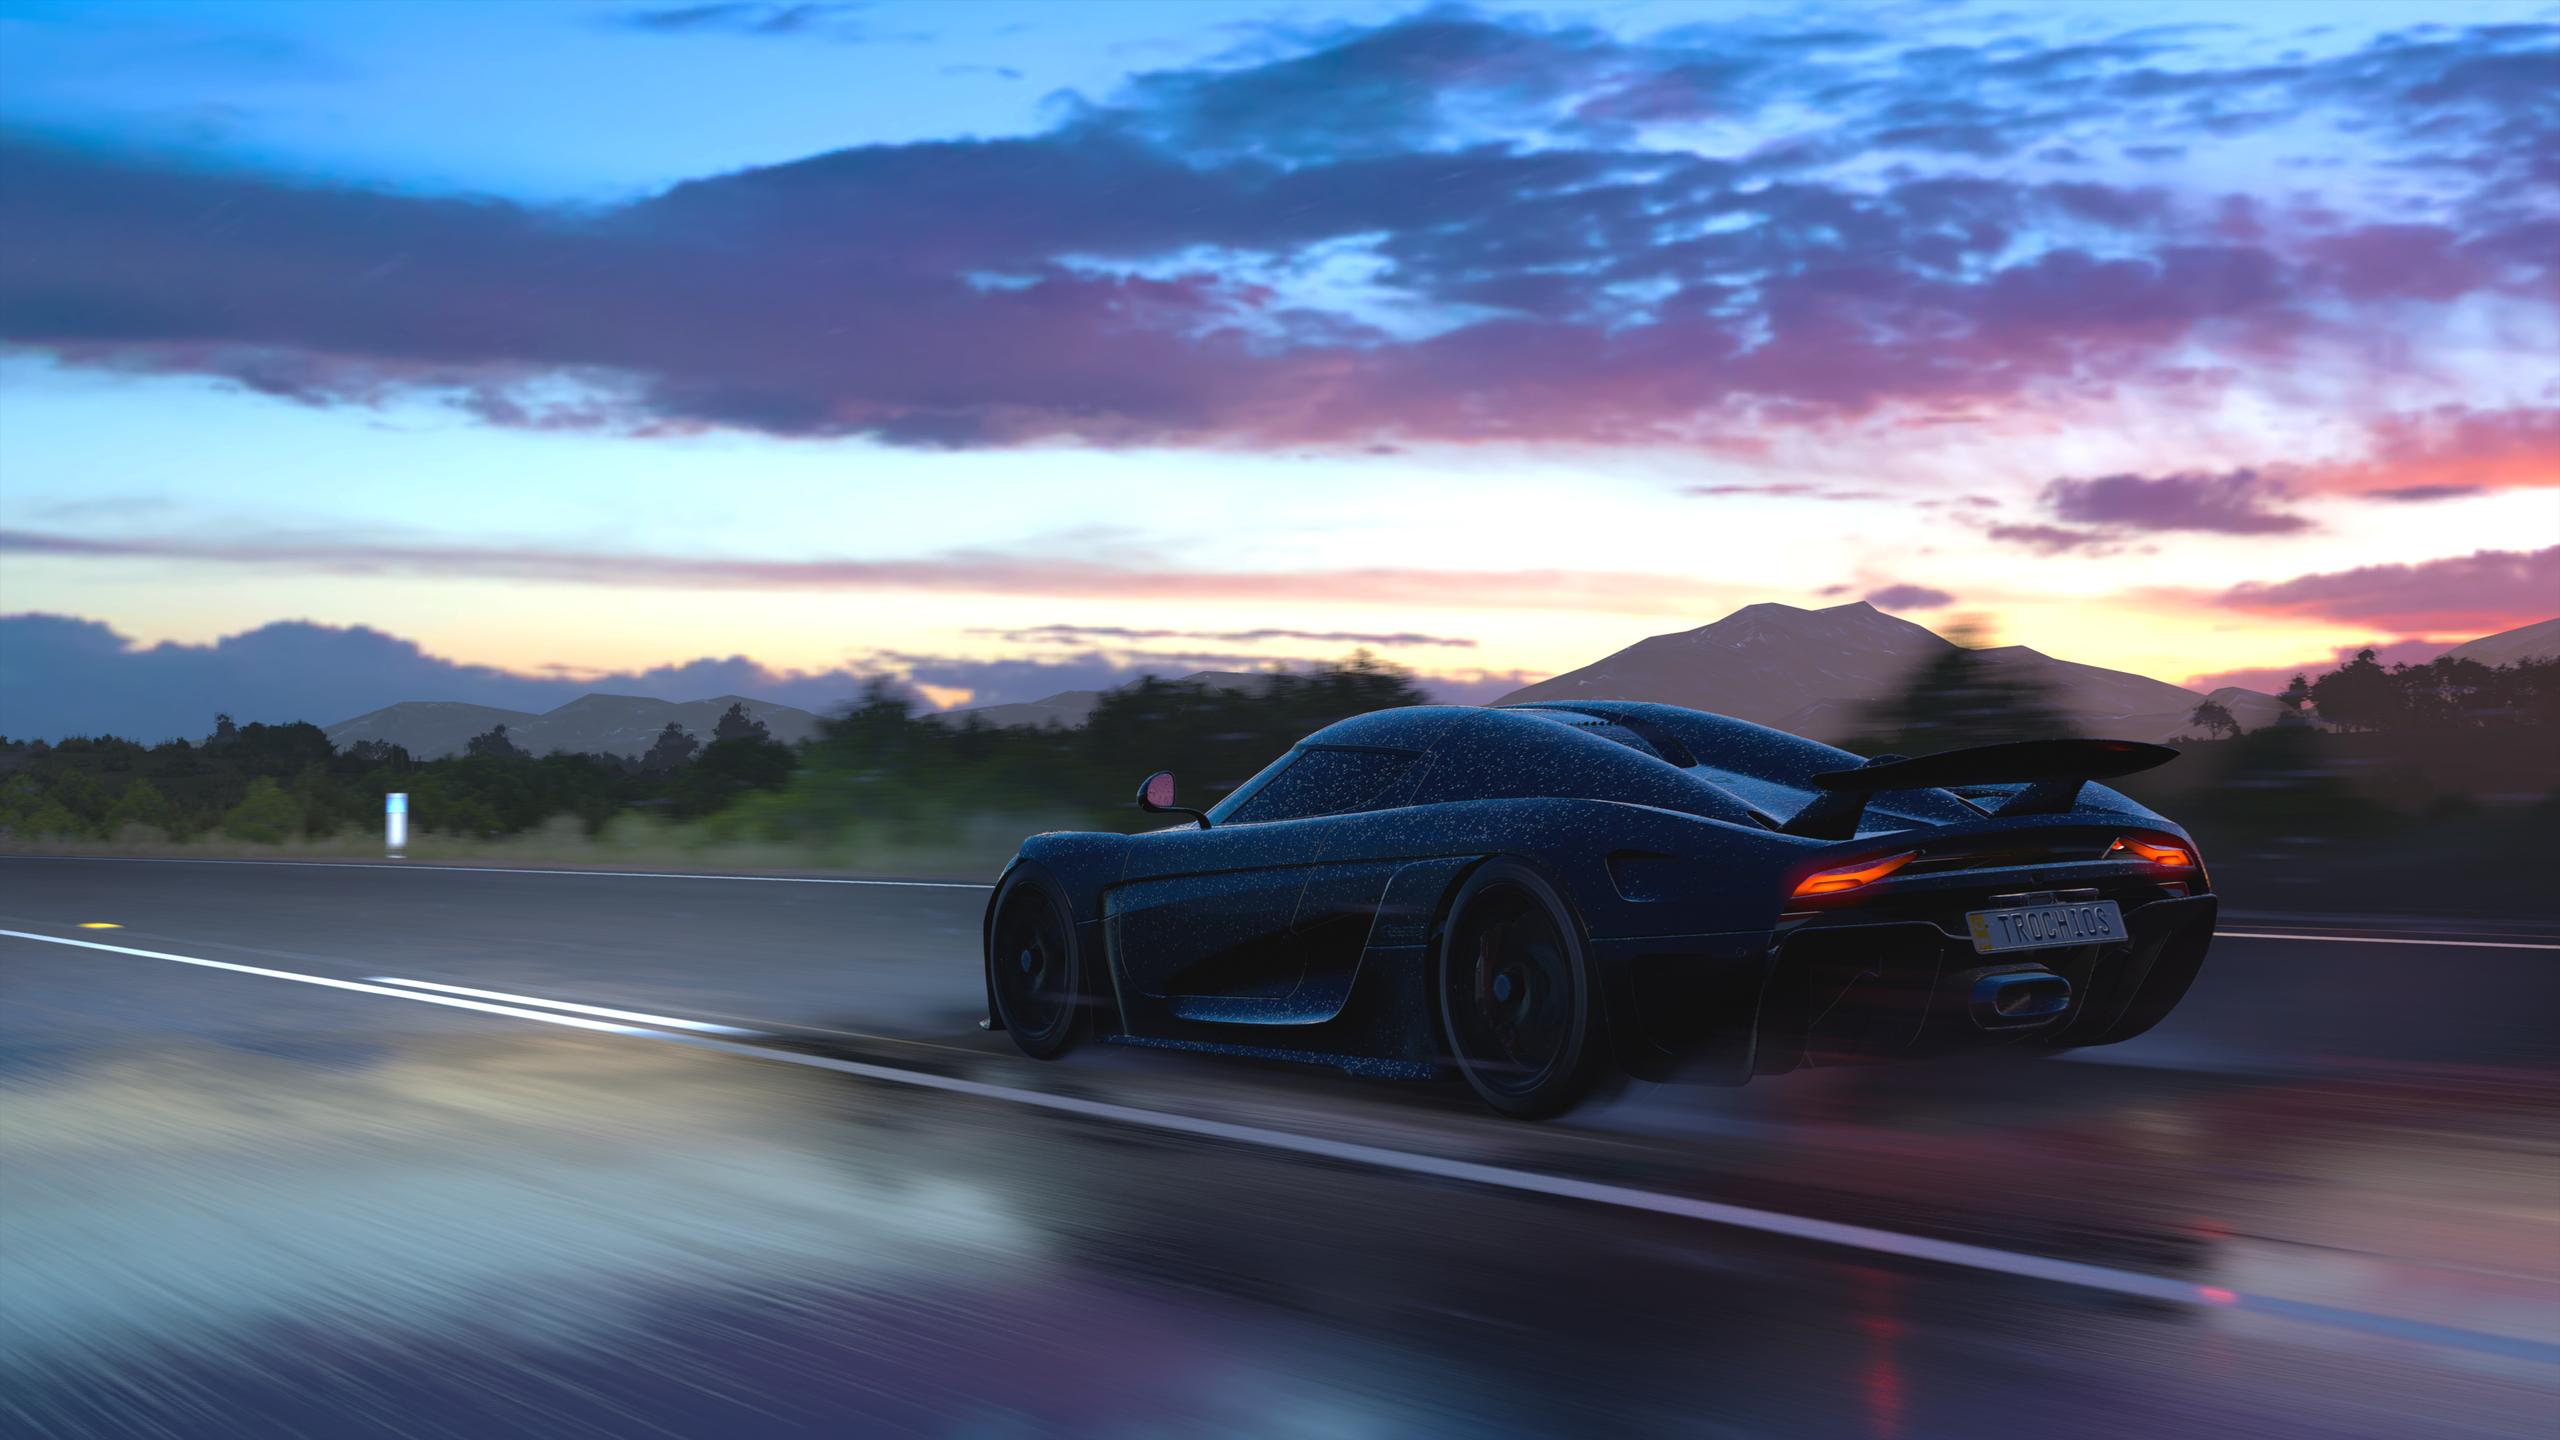 Forza Horizon 3 Background: 2560x1440 Forza Horizon 3 Koenigsegg Regera 4k 1440P